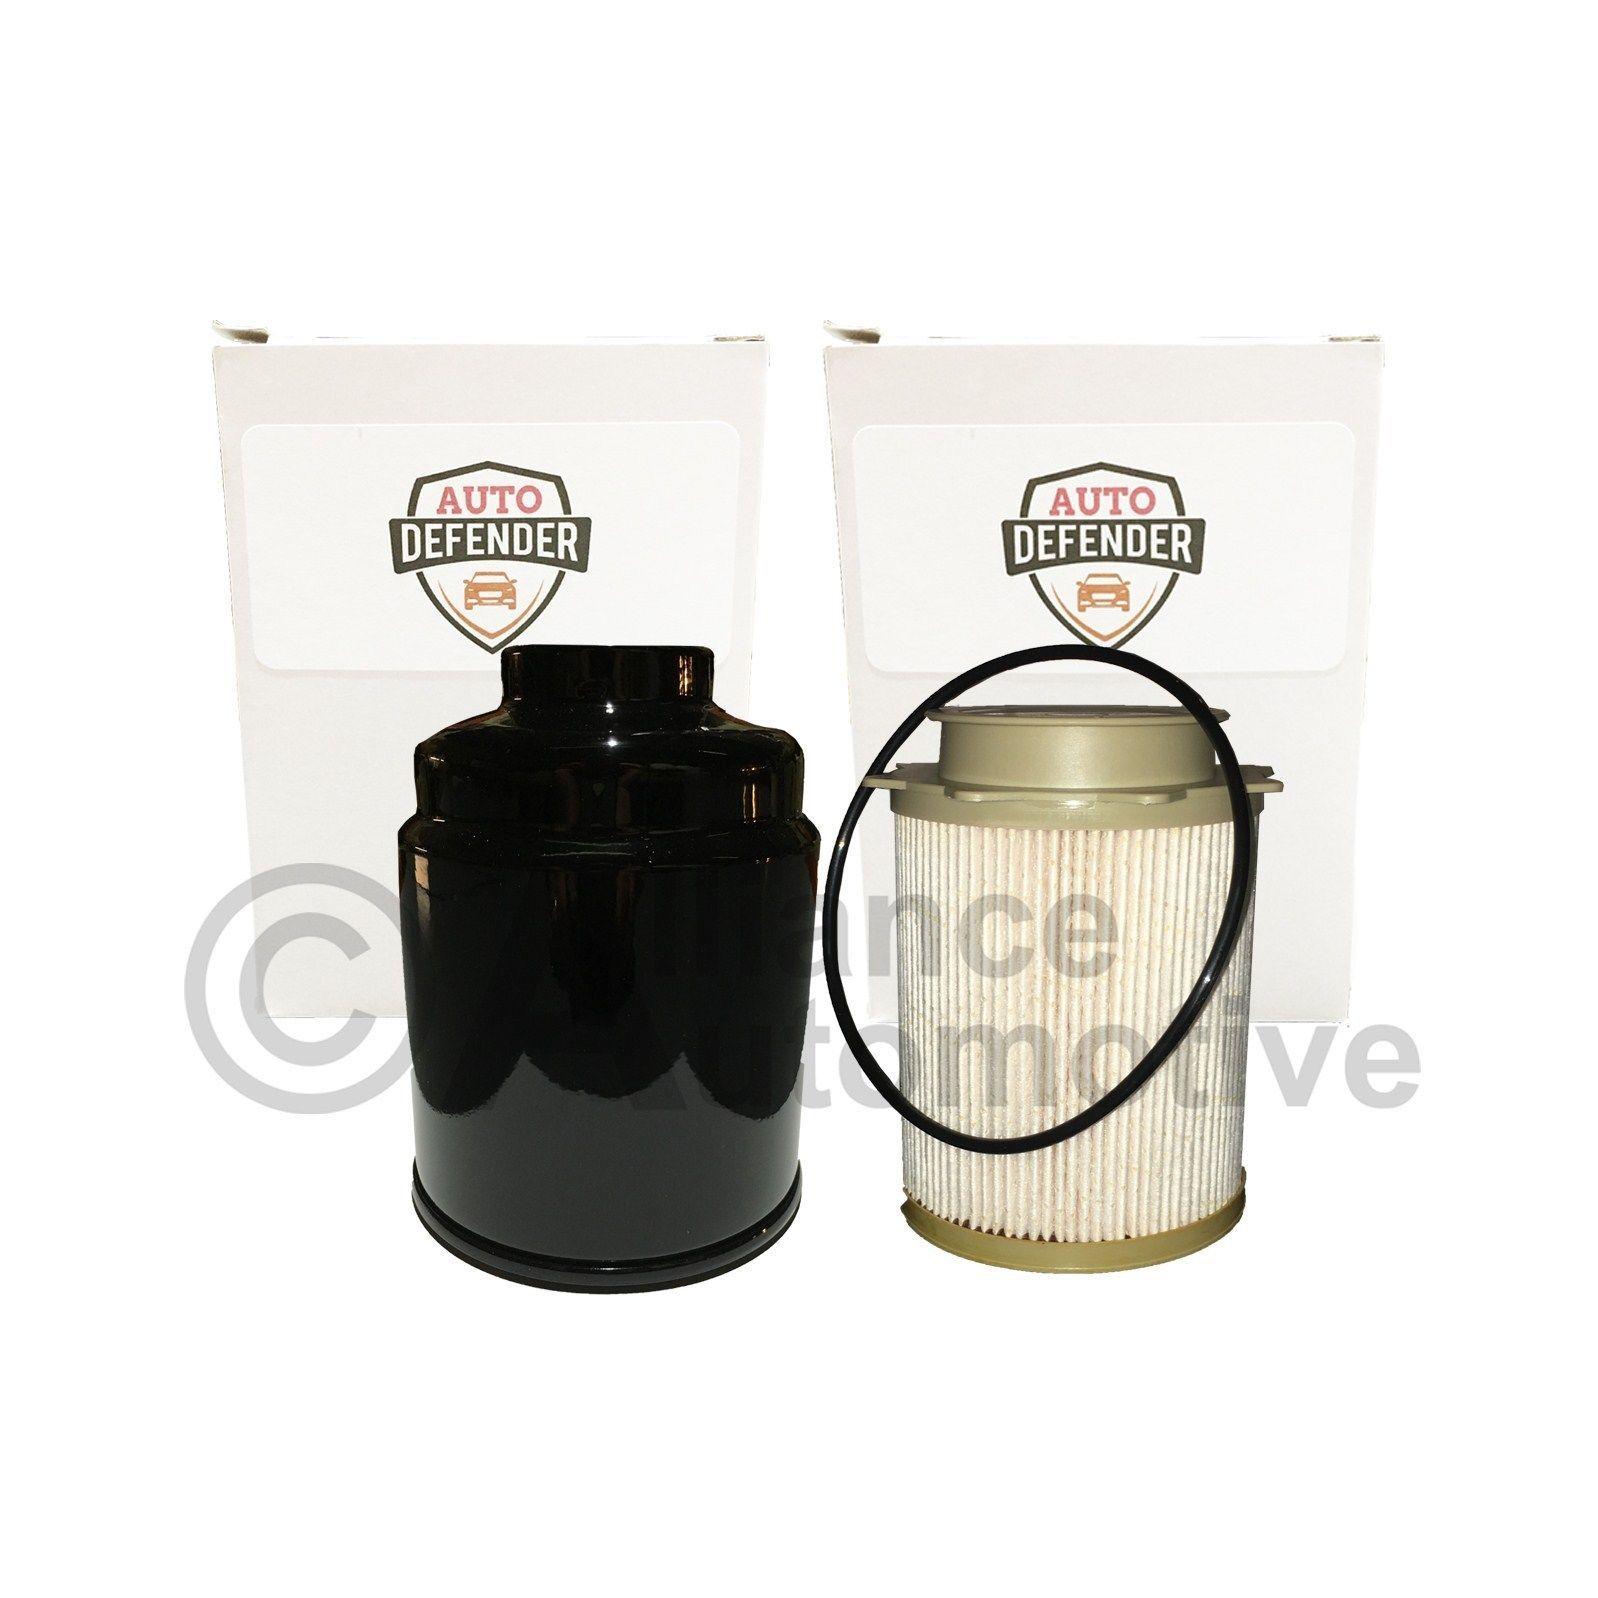 dodge ram 6 7l fuel filter kit for 2013 2016 cummins diesel front rear filter filter front rear diesel cummins fuel dodge [ 1598 x 1598 Pixel ]